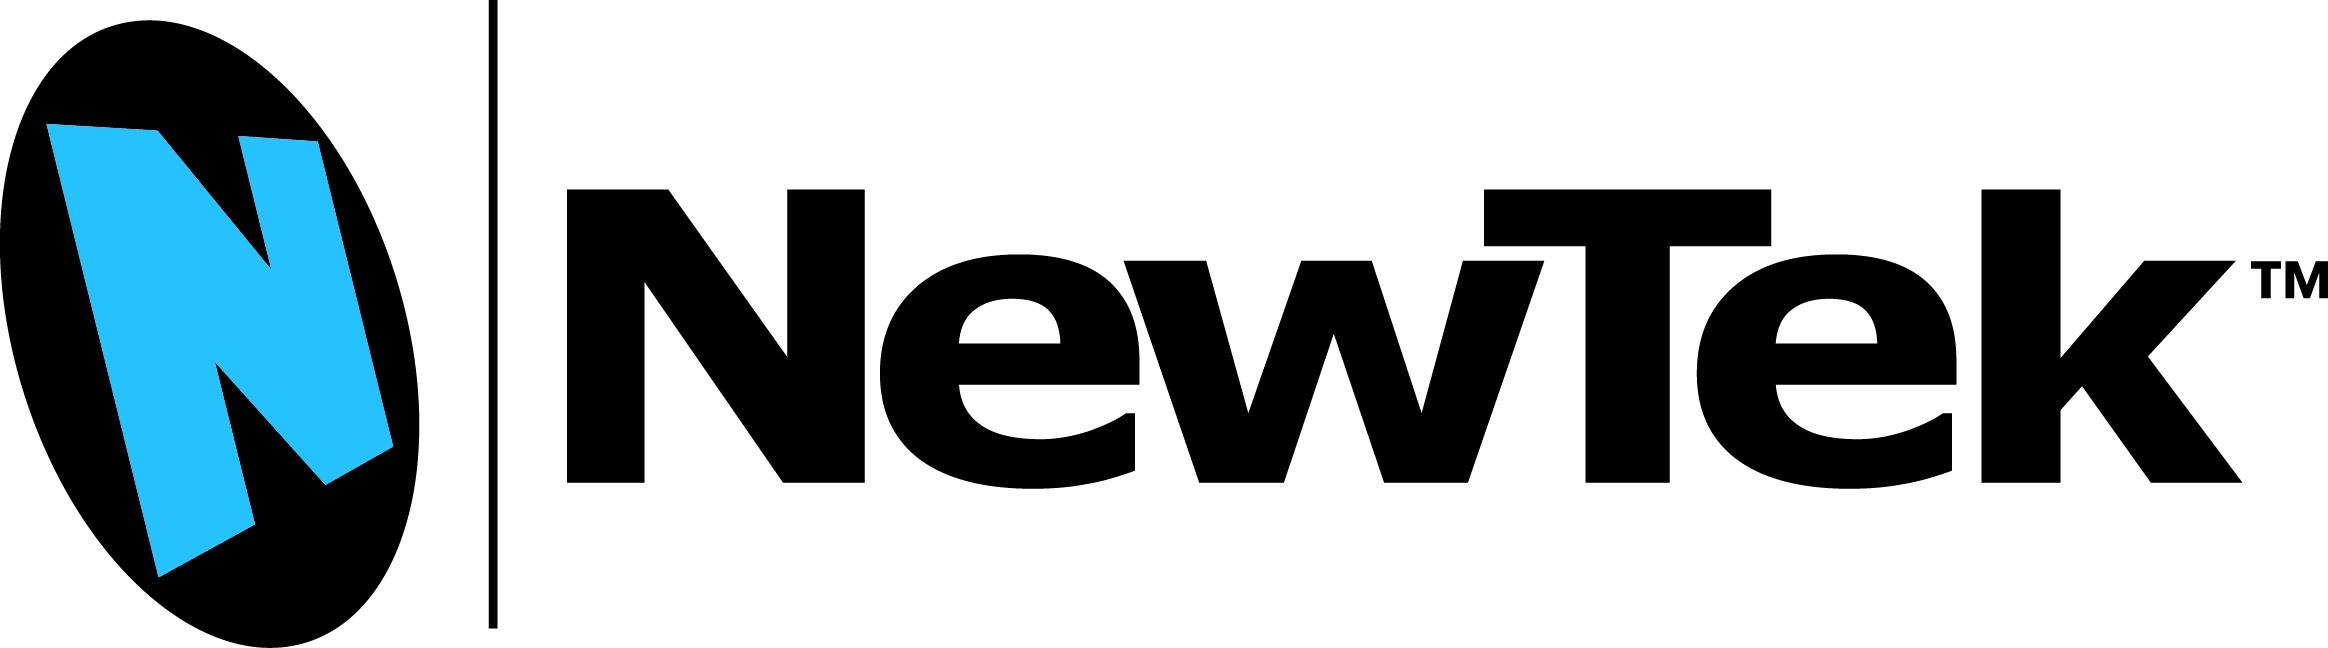 NewTek_logo_blackblue